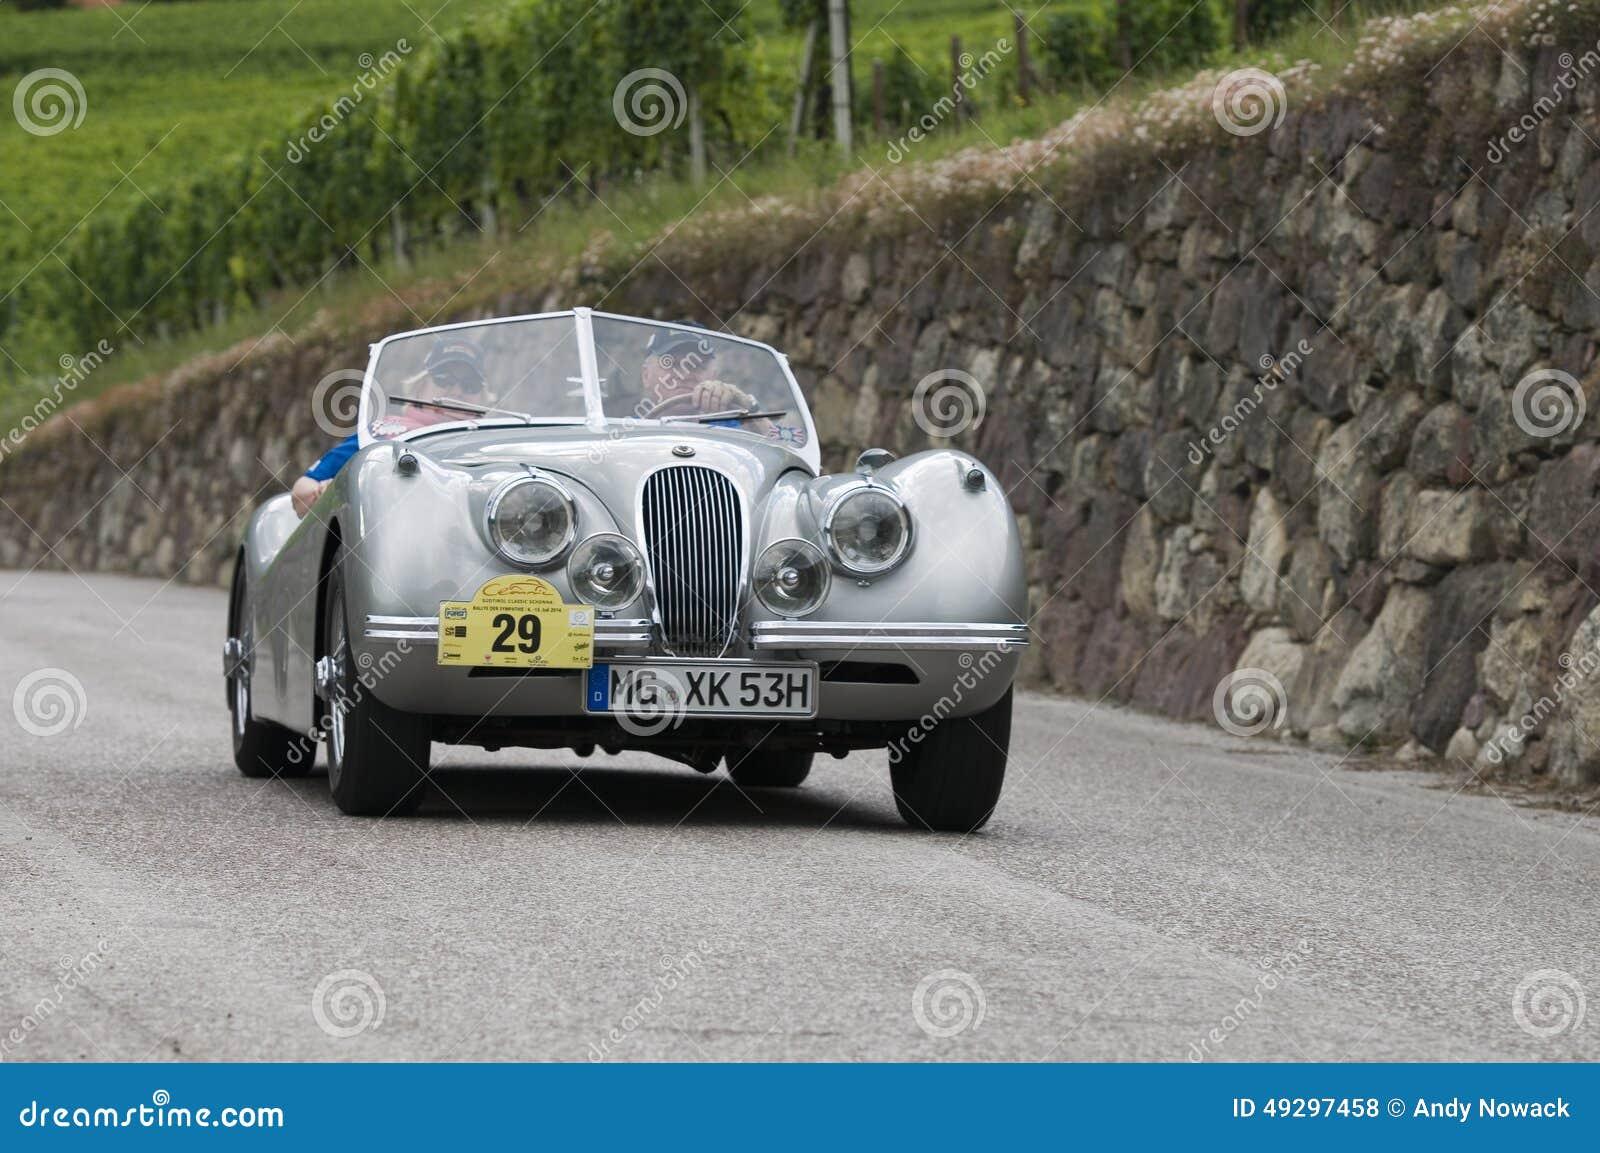 Süd-Tirol klassisches cars_2014_Jaguar XK 120 Roadster_2